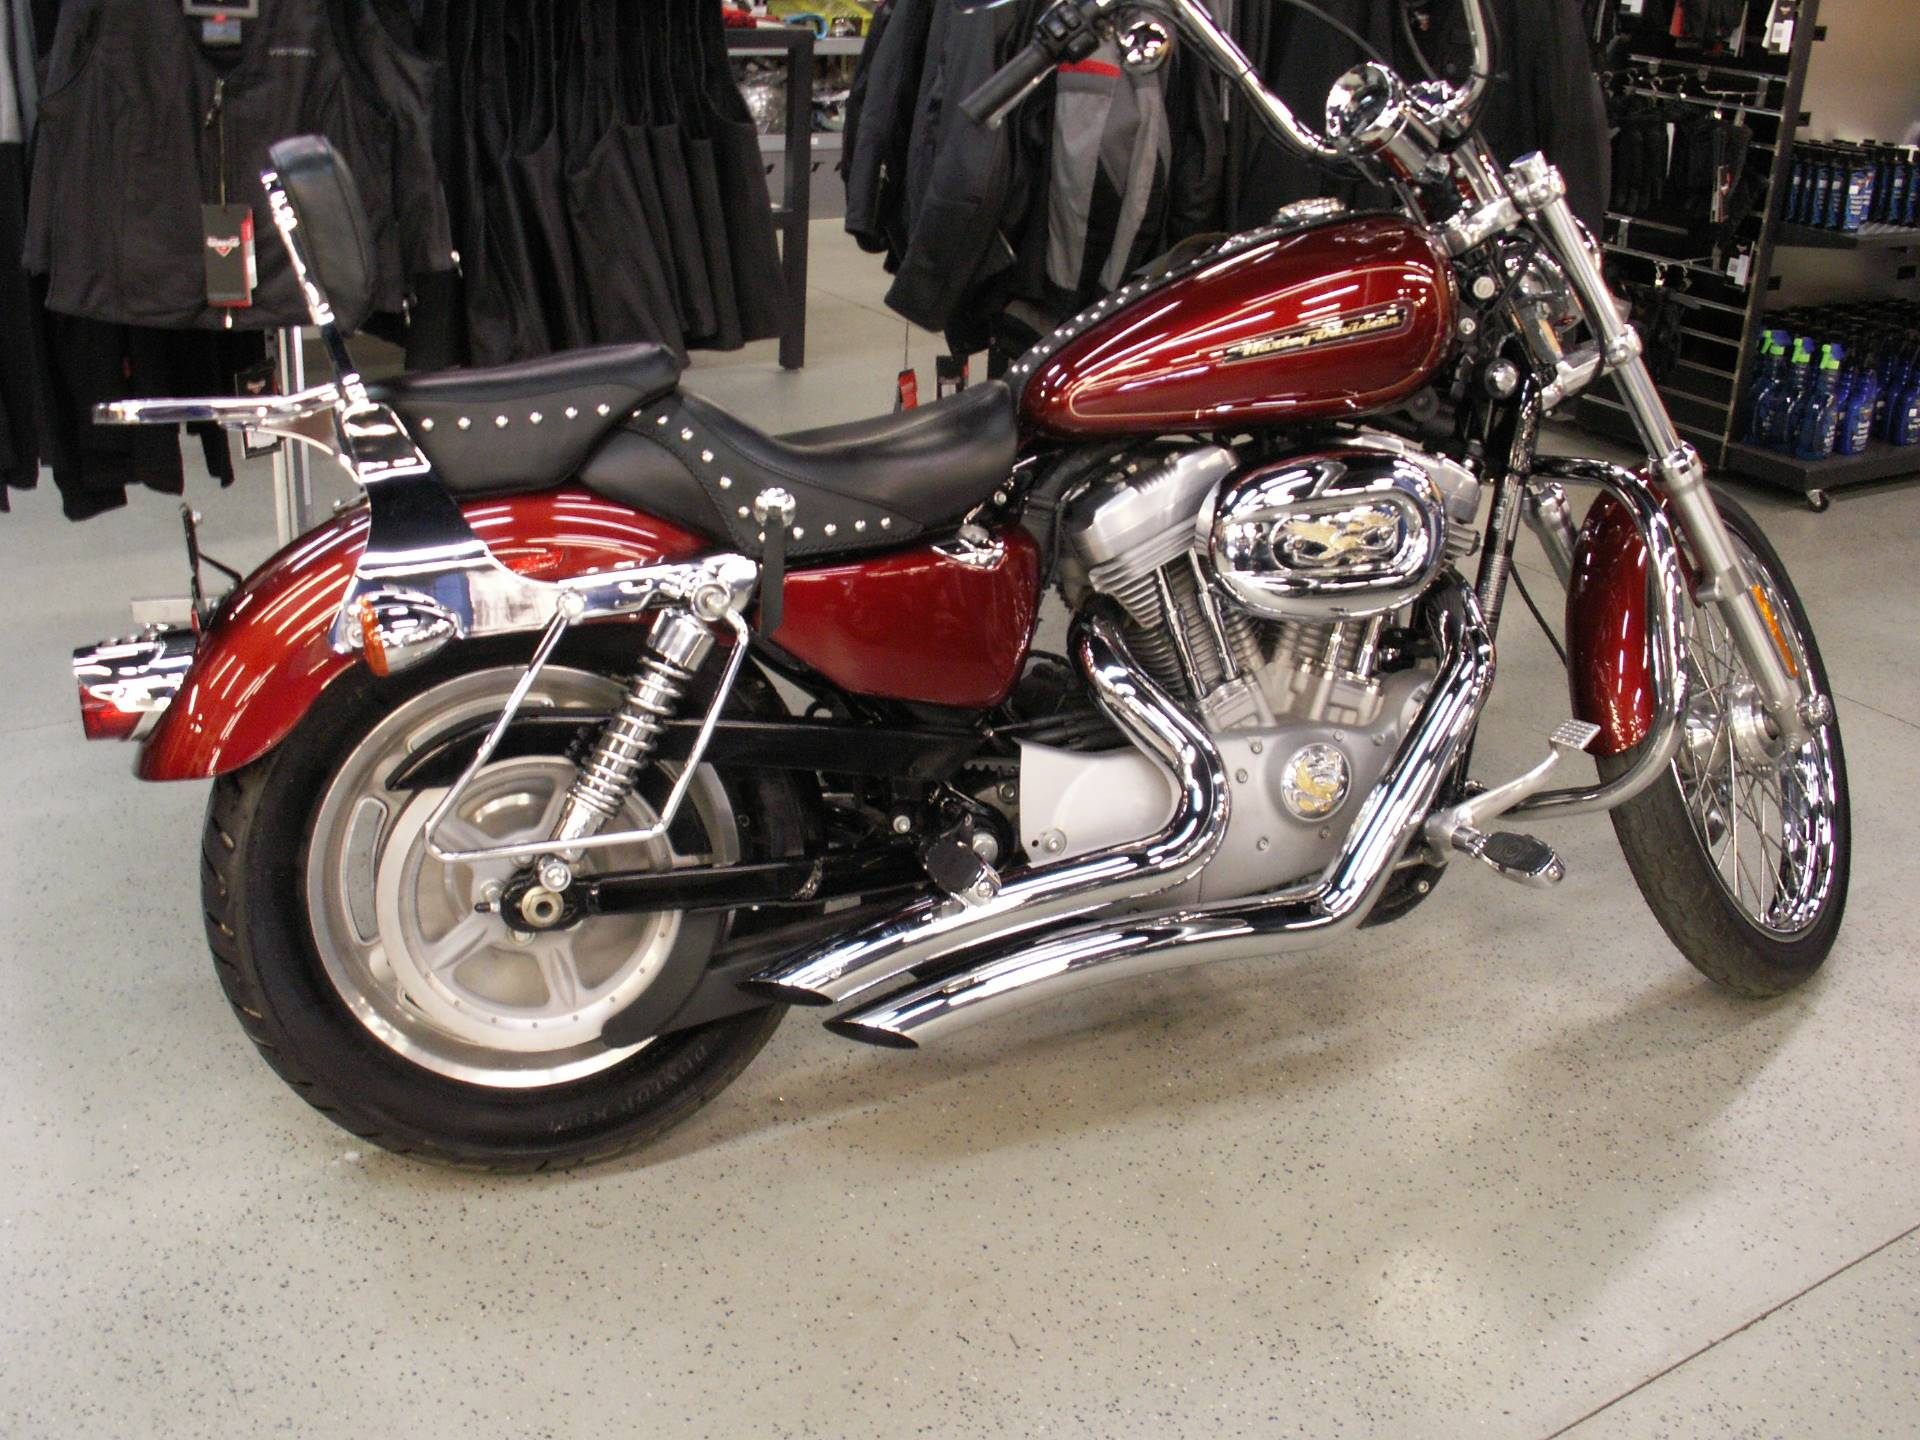 2009 Harley-Davidson Sportster 883 Custom 4